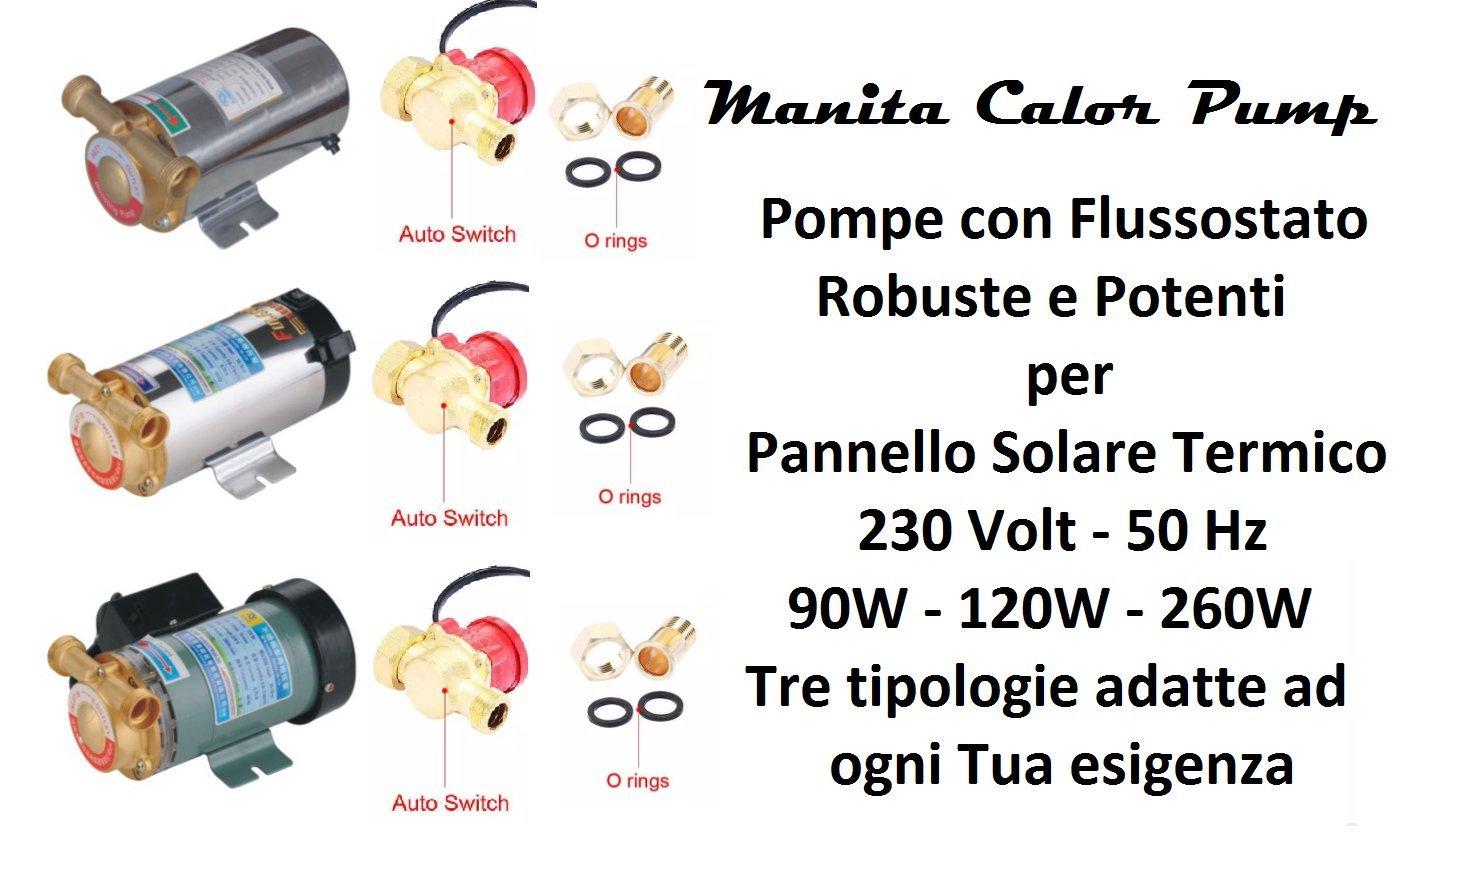 Pumpe Edelstahl Manita Calor Autoklav 90 W mit flussostato Sonnenkollektor heißes Wasser